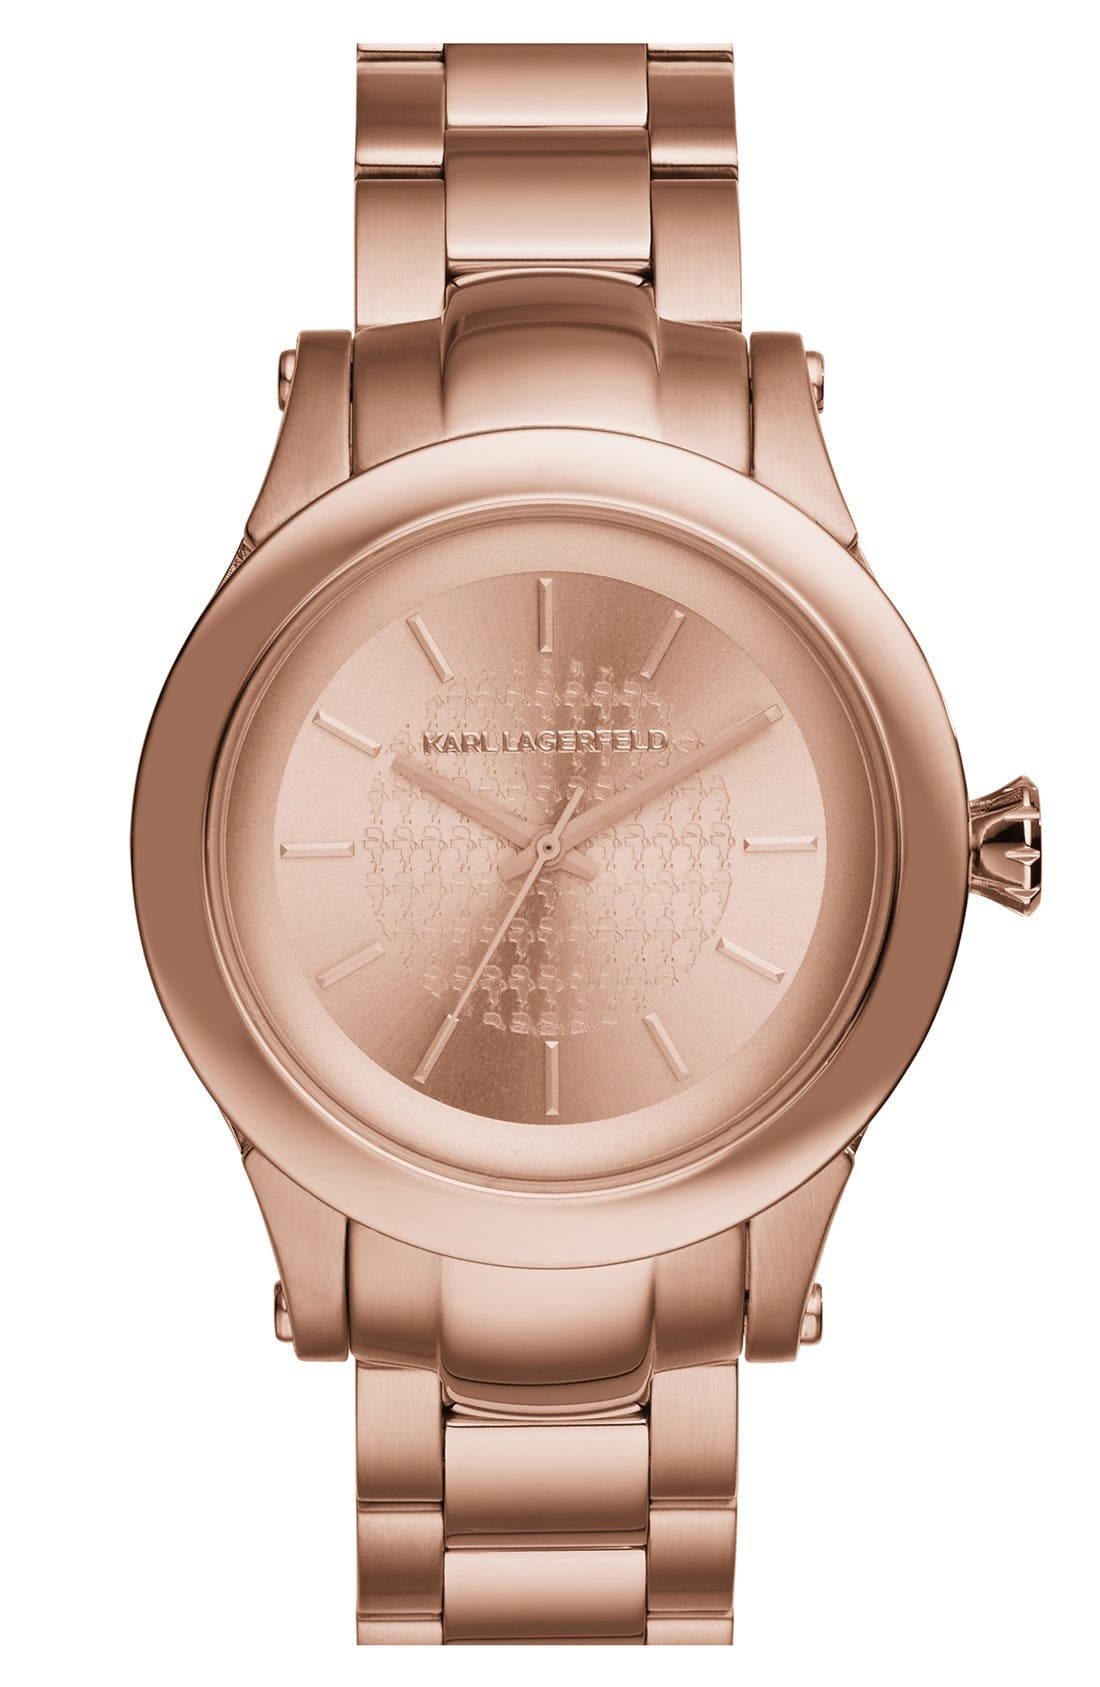 KARL LAGERFELD PARIS,                             KARL LAGERFELD Round Bracelet Watch, 39mm,                             Main thumbnail 1, color,                             711